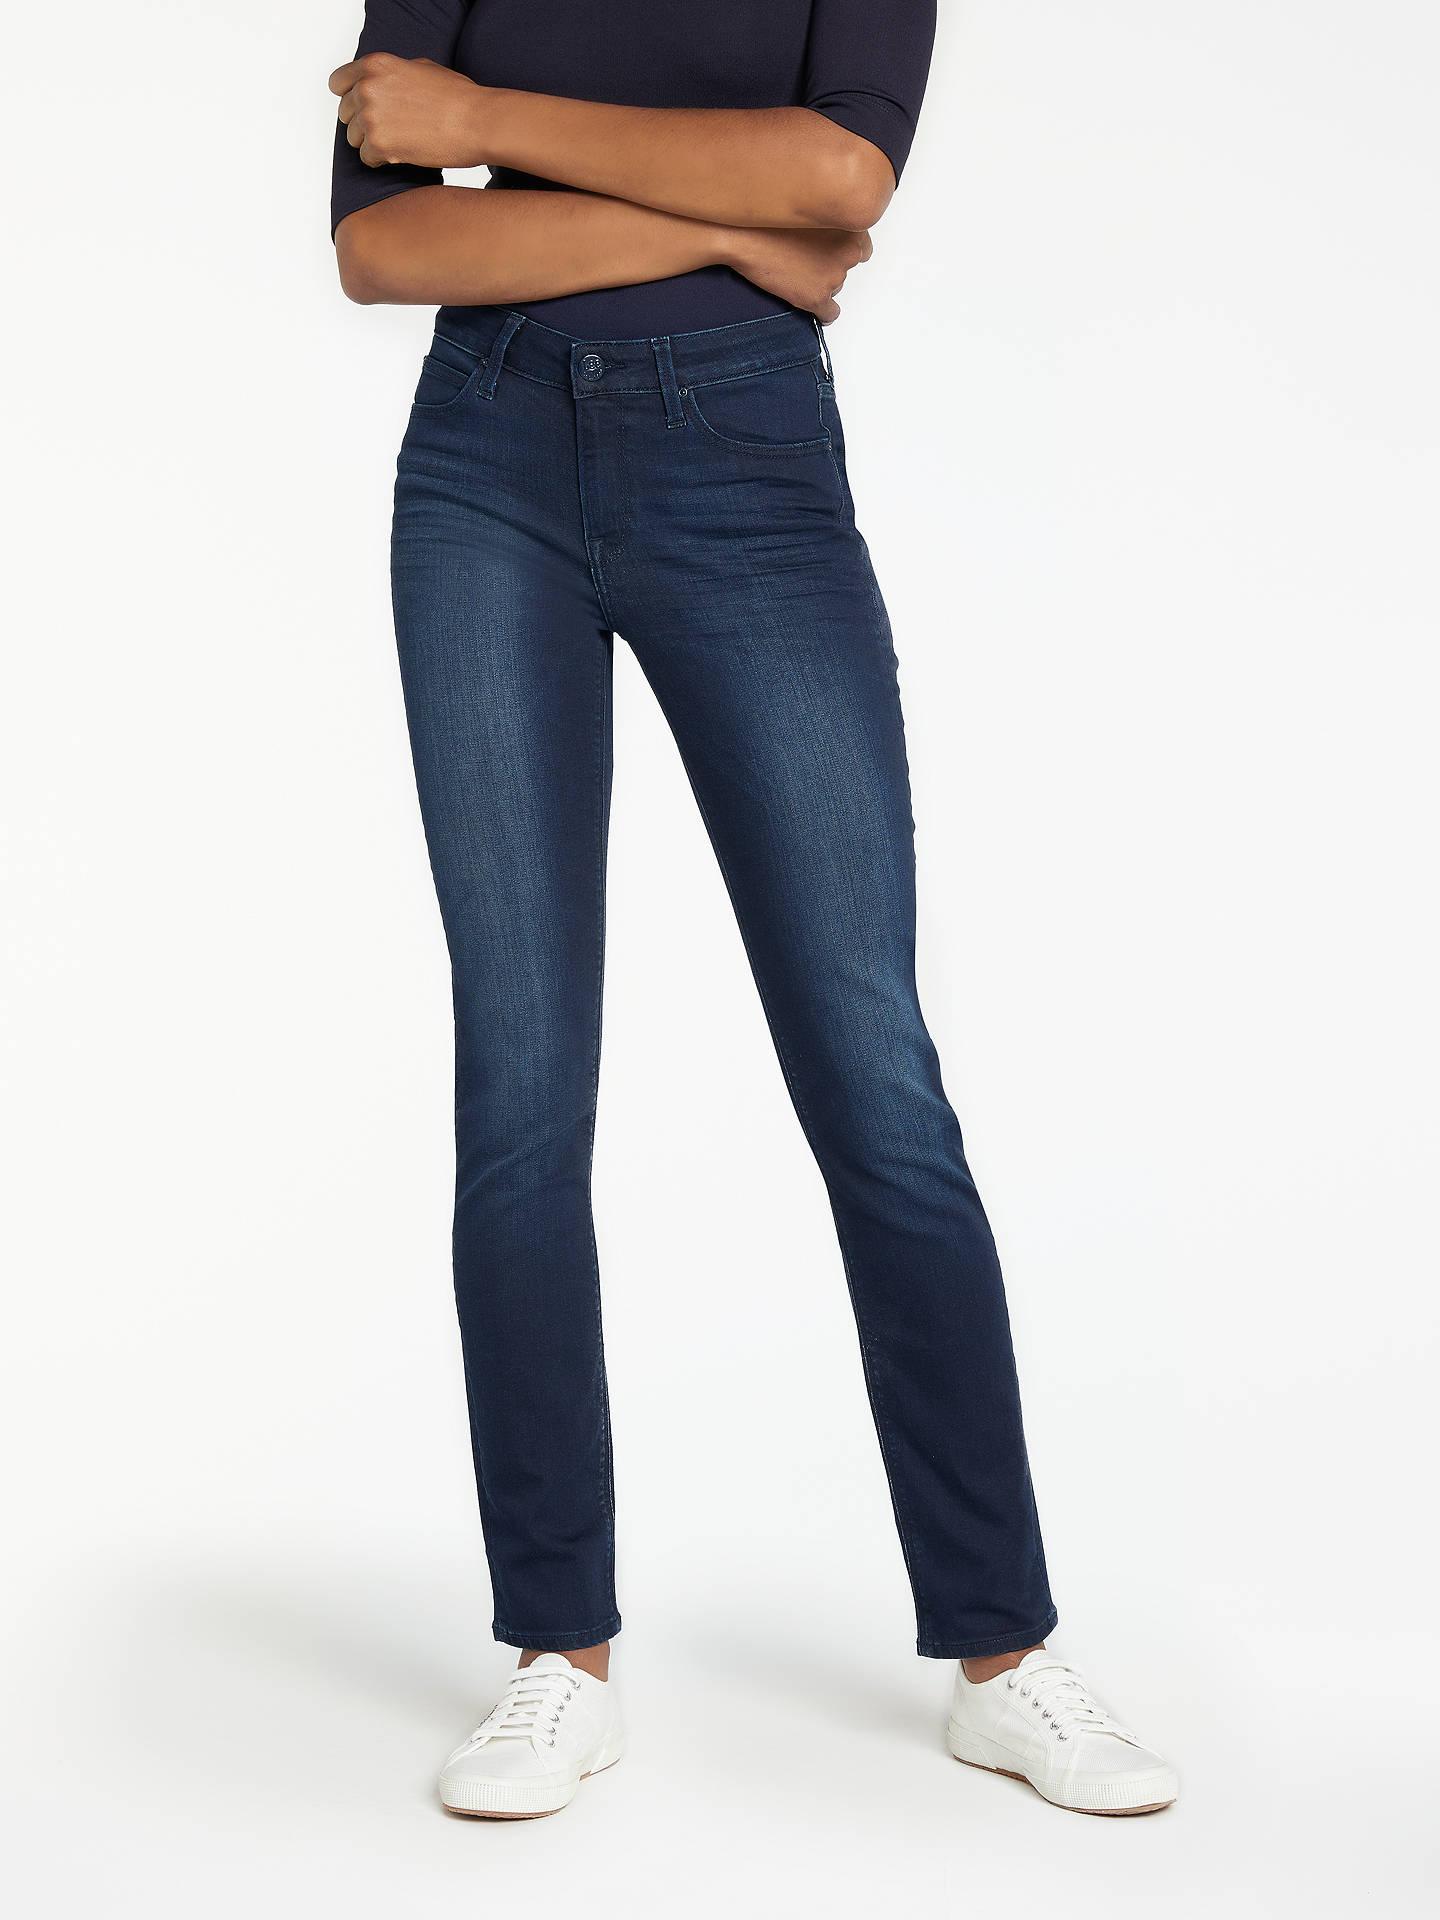 8a232435 Lee Elly High Waist Slim Leg Jeans, Super Dark at John Lewis & Partners